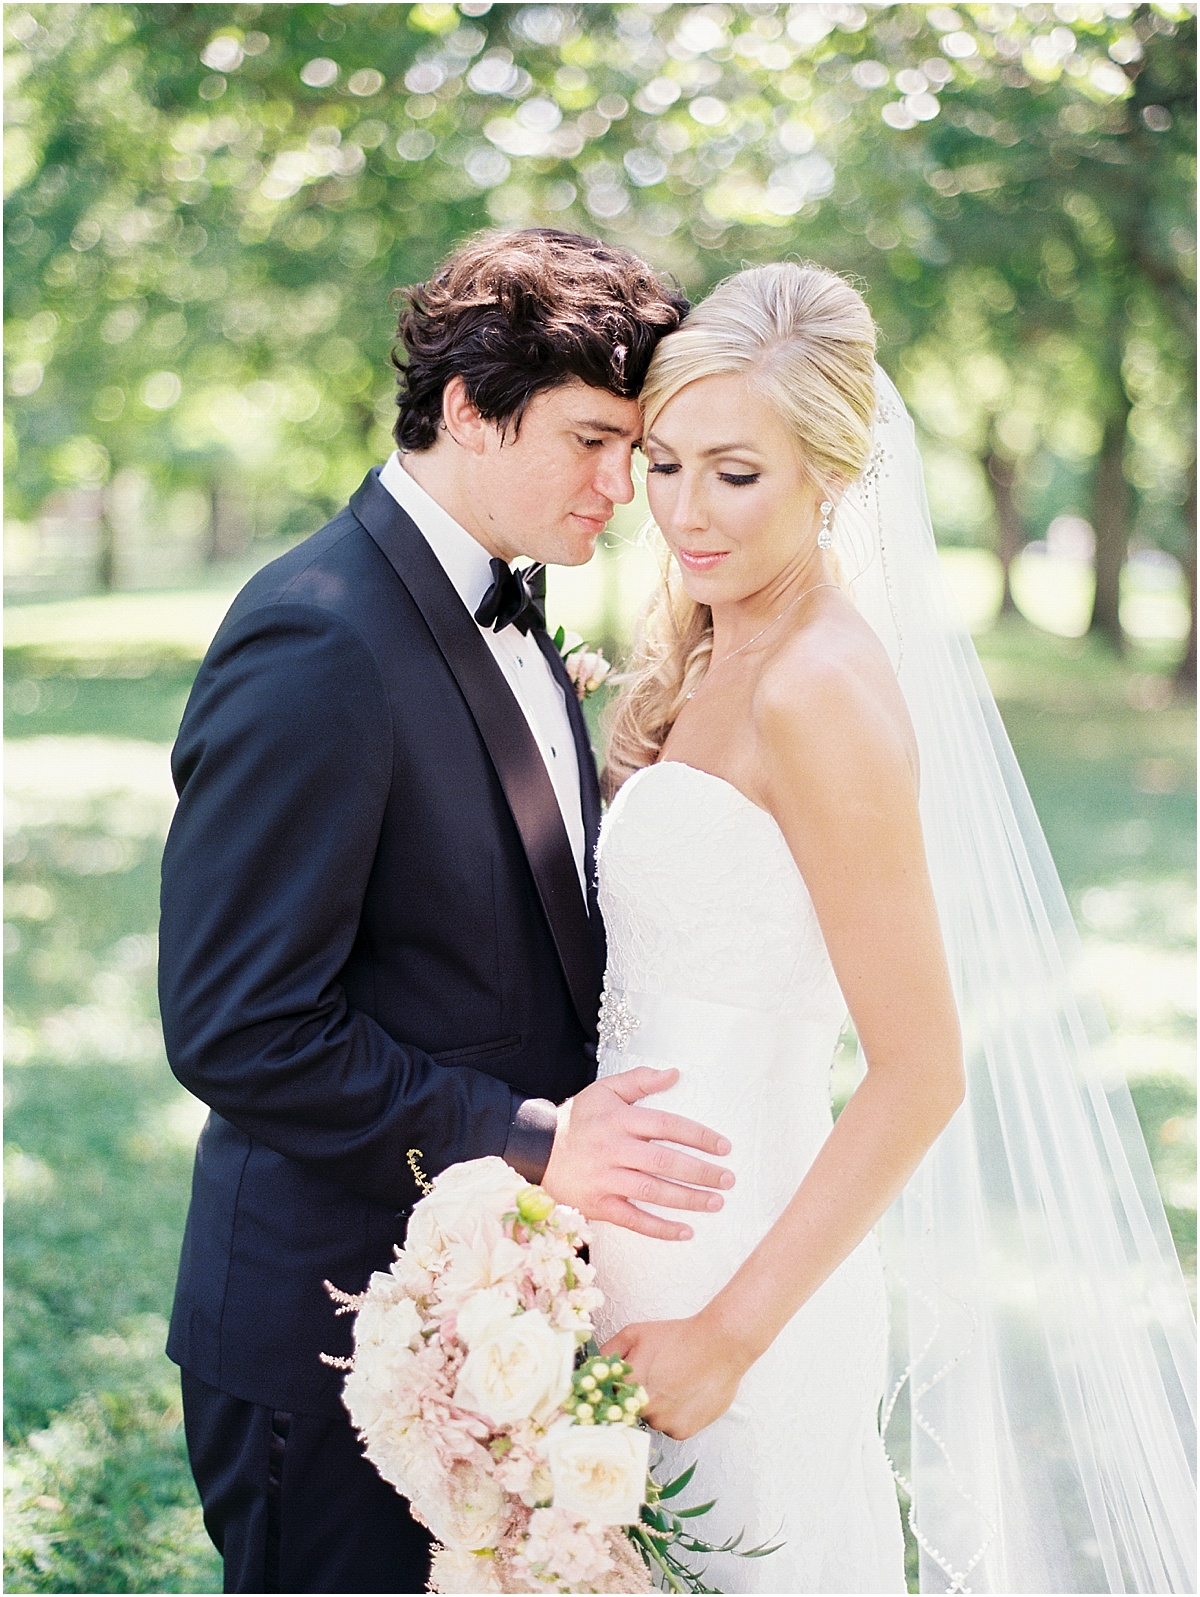 St_Louis_Wedding_Fine_Art_Film_Photographer_Jordan_Brittley_(www.jordanbrittley.com)_0023.jpg